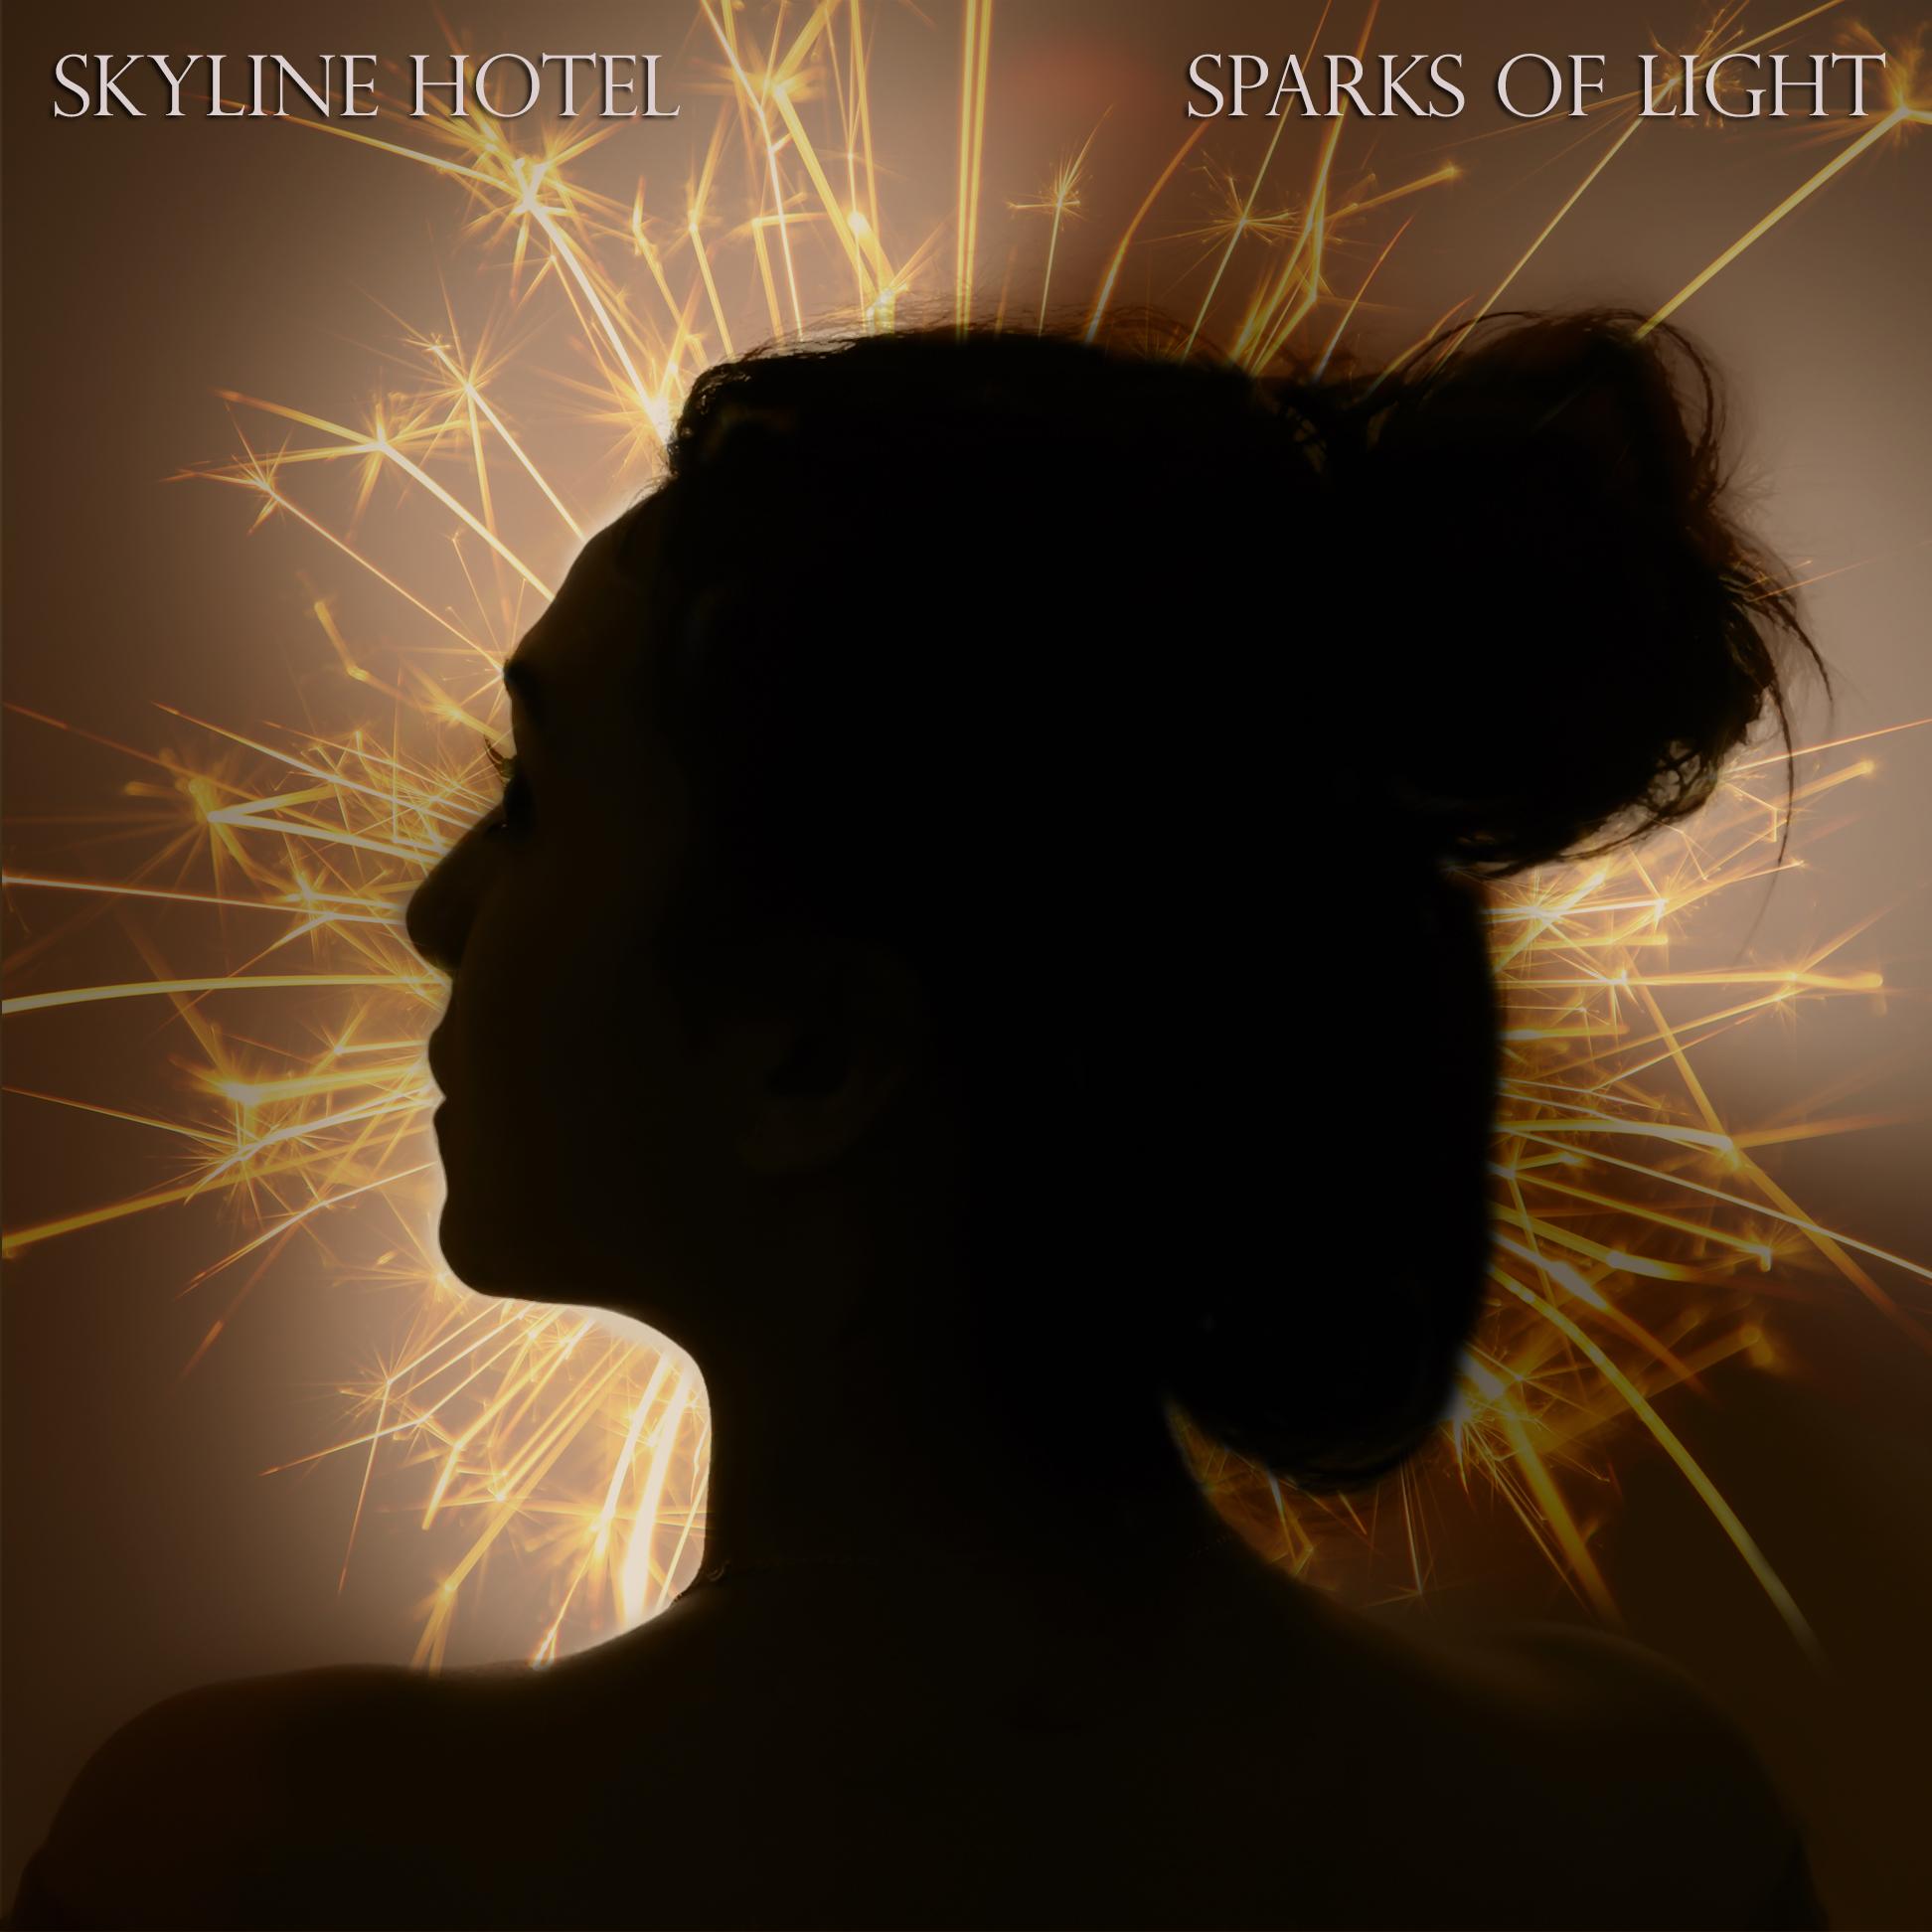 Skyline Hotel Sparks of Light Coverart